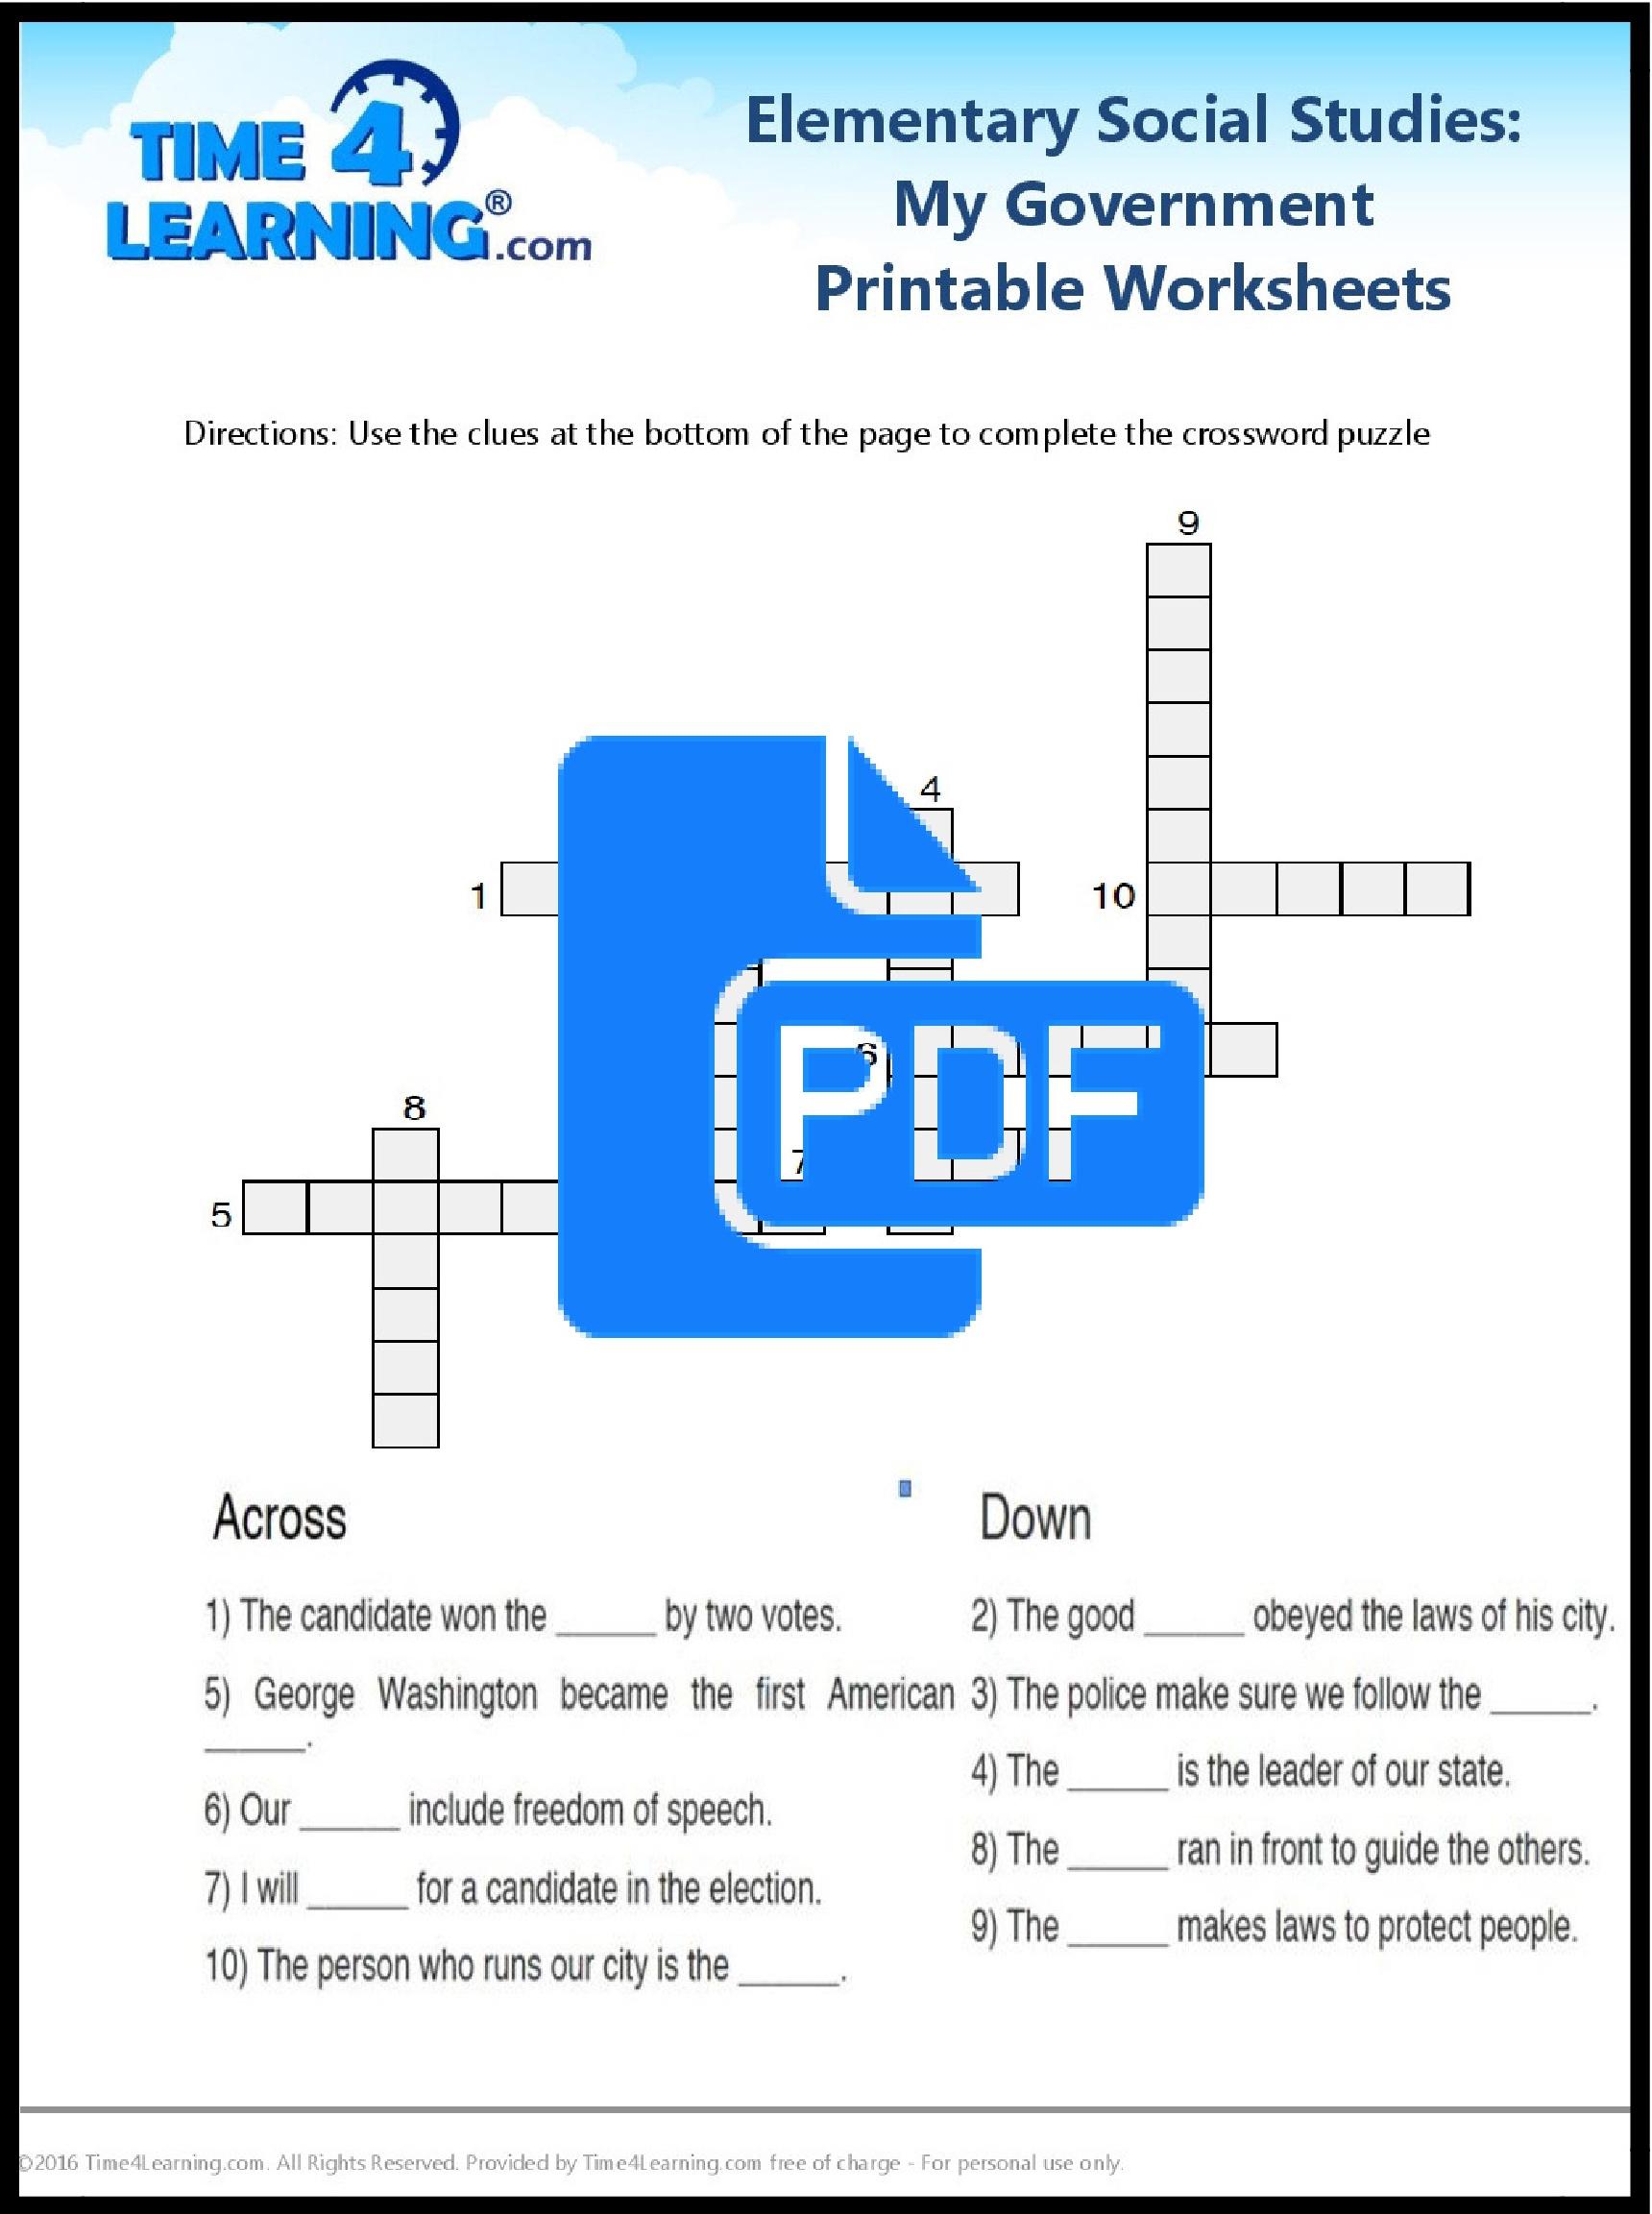 Free Printable: Elementary Social Studies Worksheet | Time4Learning - Free Printable Social Studies Worksheets For 8Th Grade